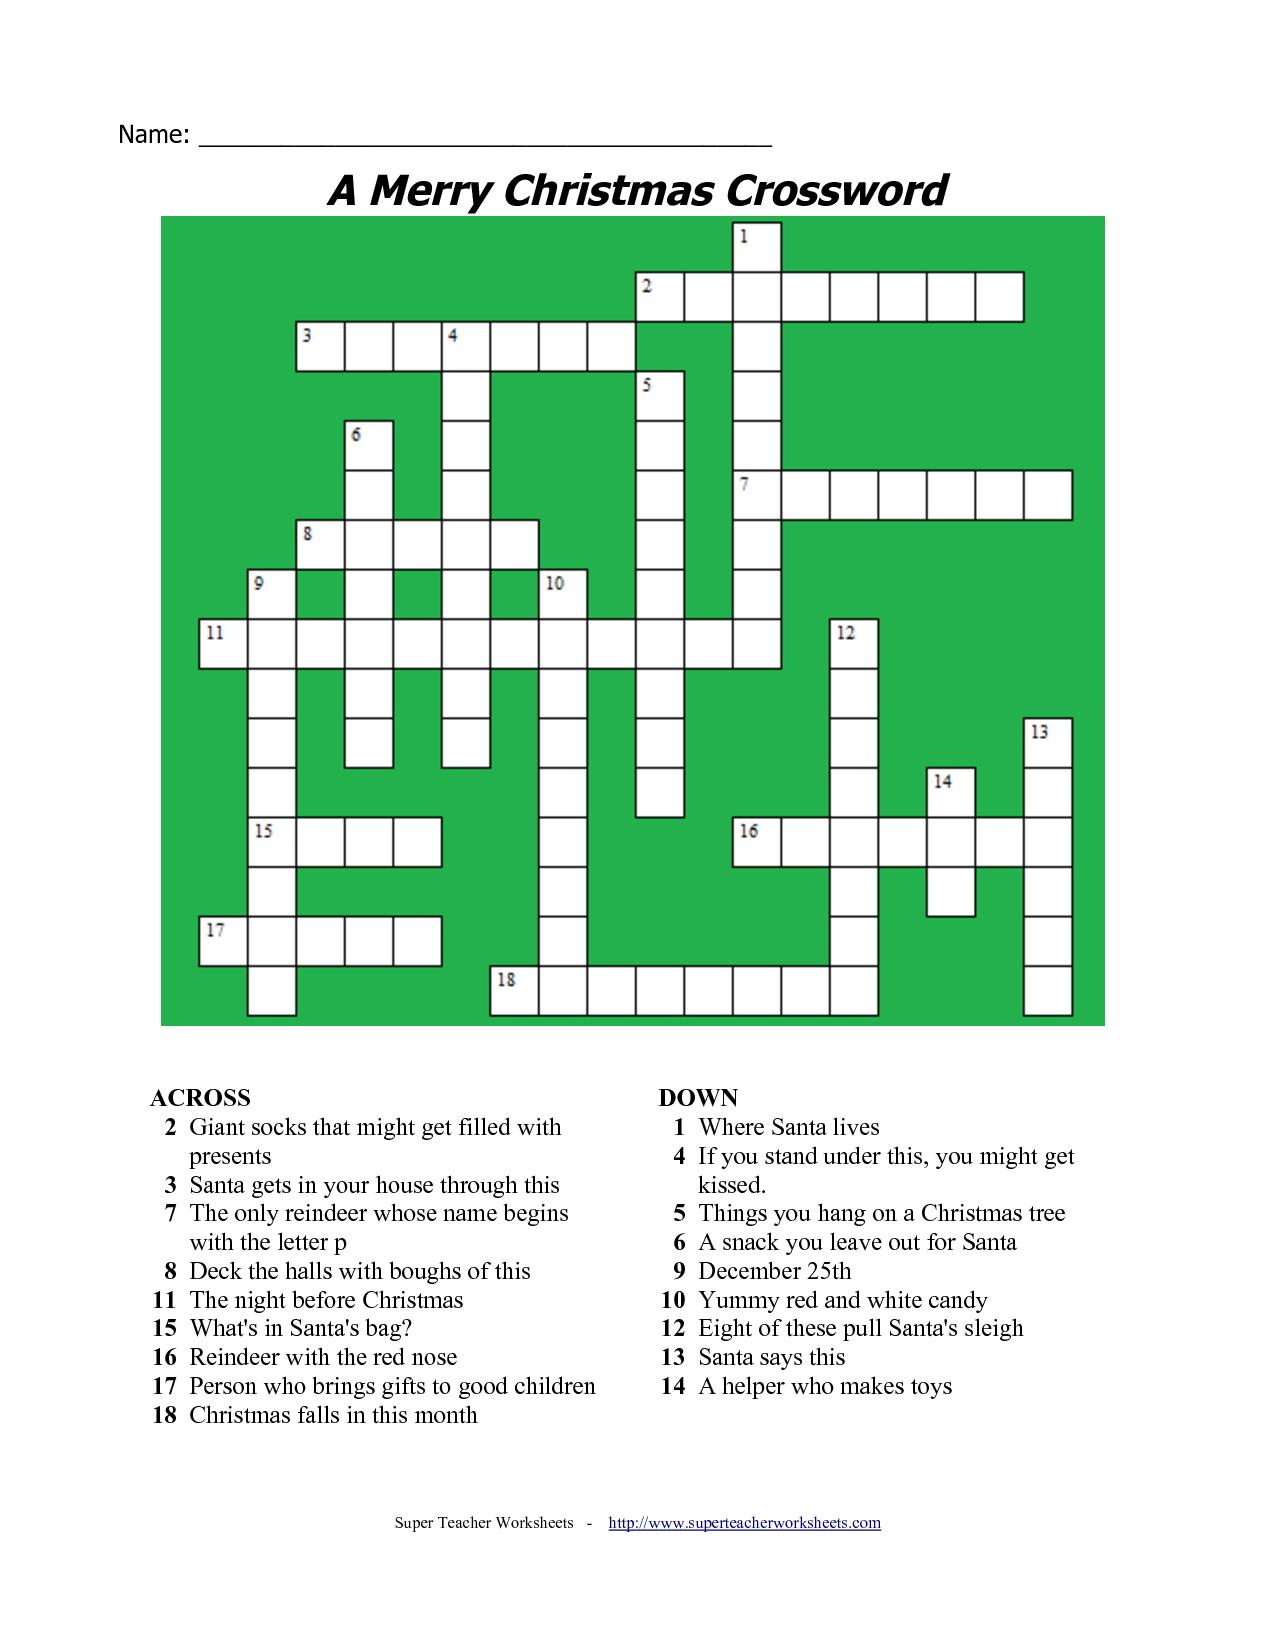 20 Fun Printable Christmas Crossword Puzzles | Kittybabylove - Free Printable Christmas Puzzle Sheets